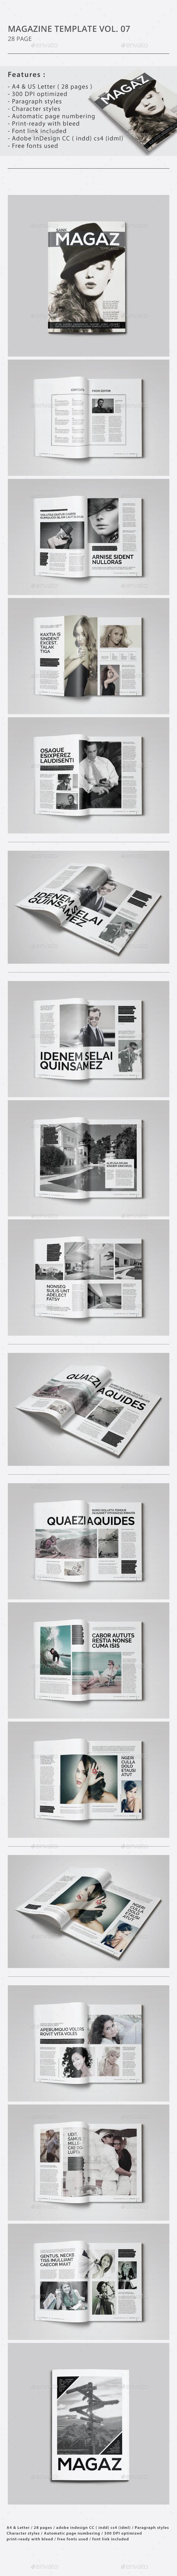 Indesign Magazine Template Vol.07 - Magazines Print Templates